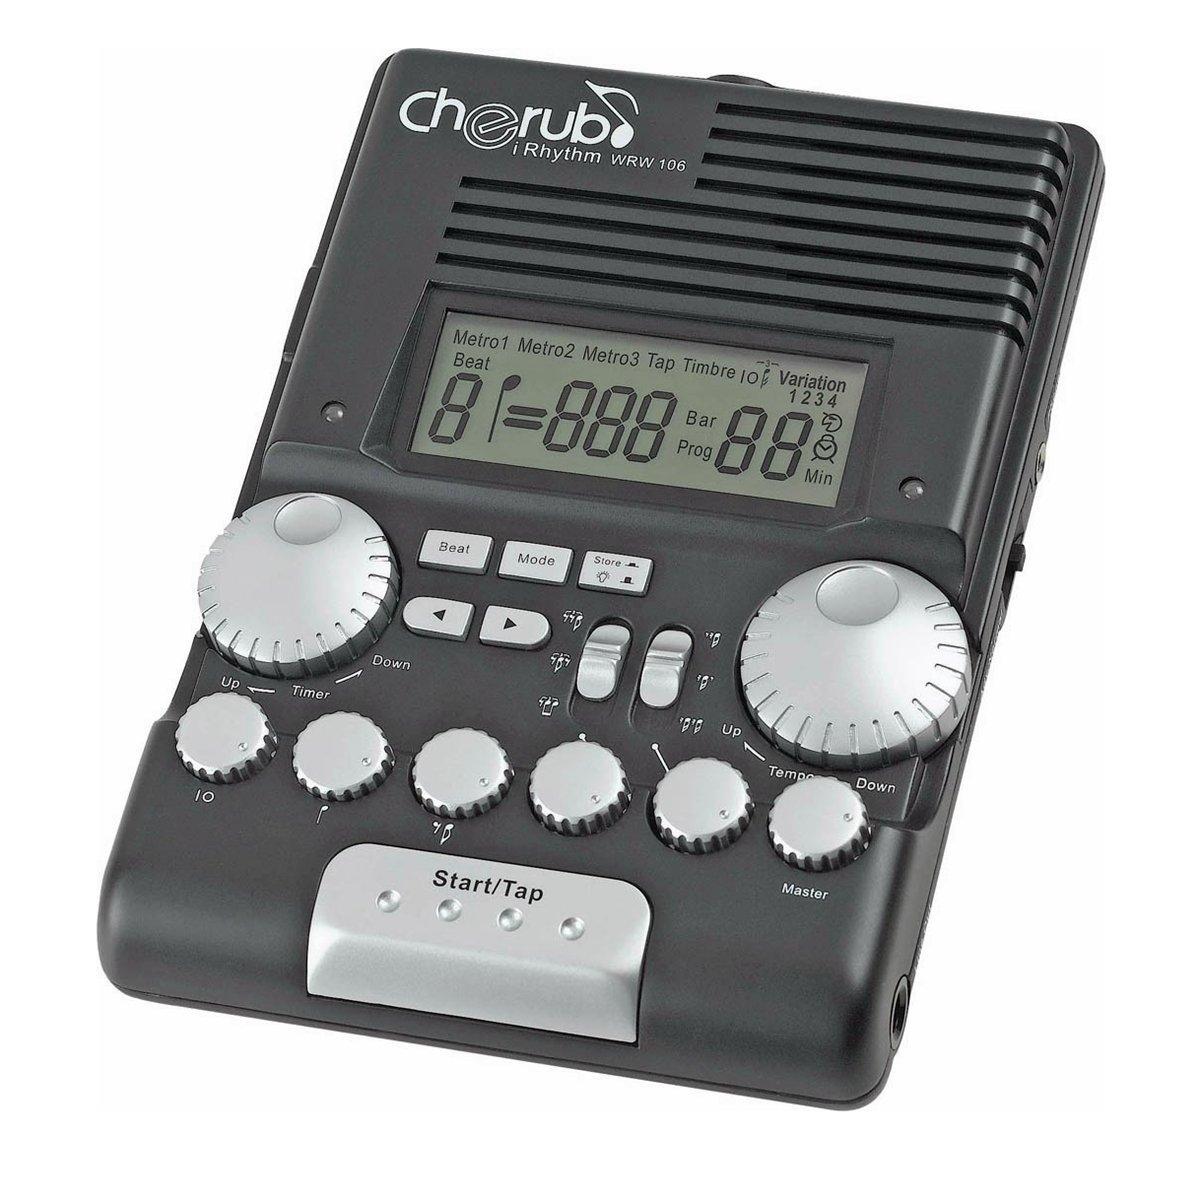 Cherub WRW-106 Drummer Trainner Metronome Rhythm Meter Cherub Technology Co .Ltd